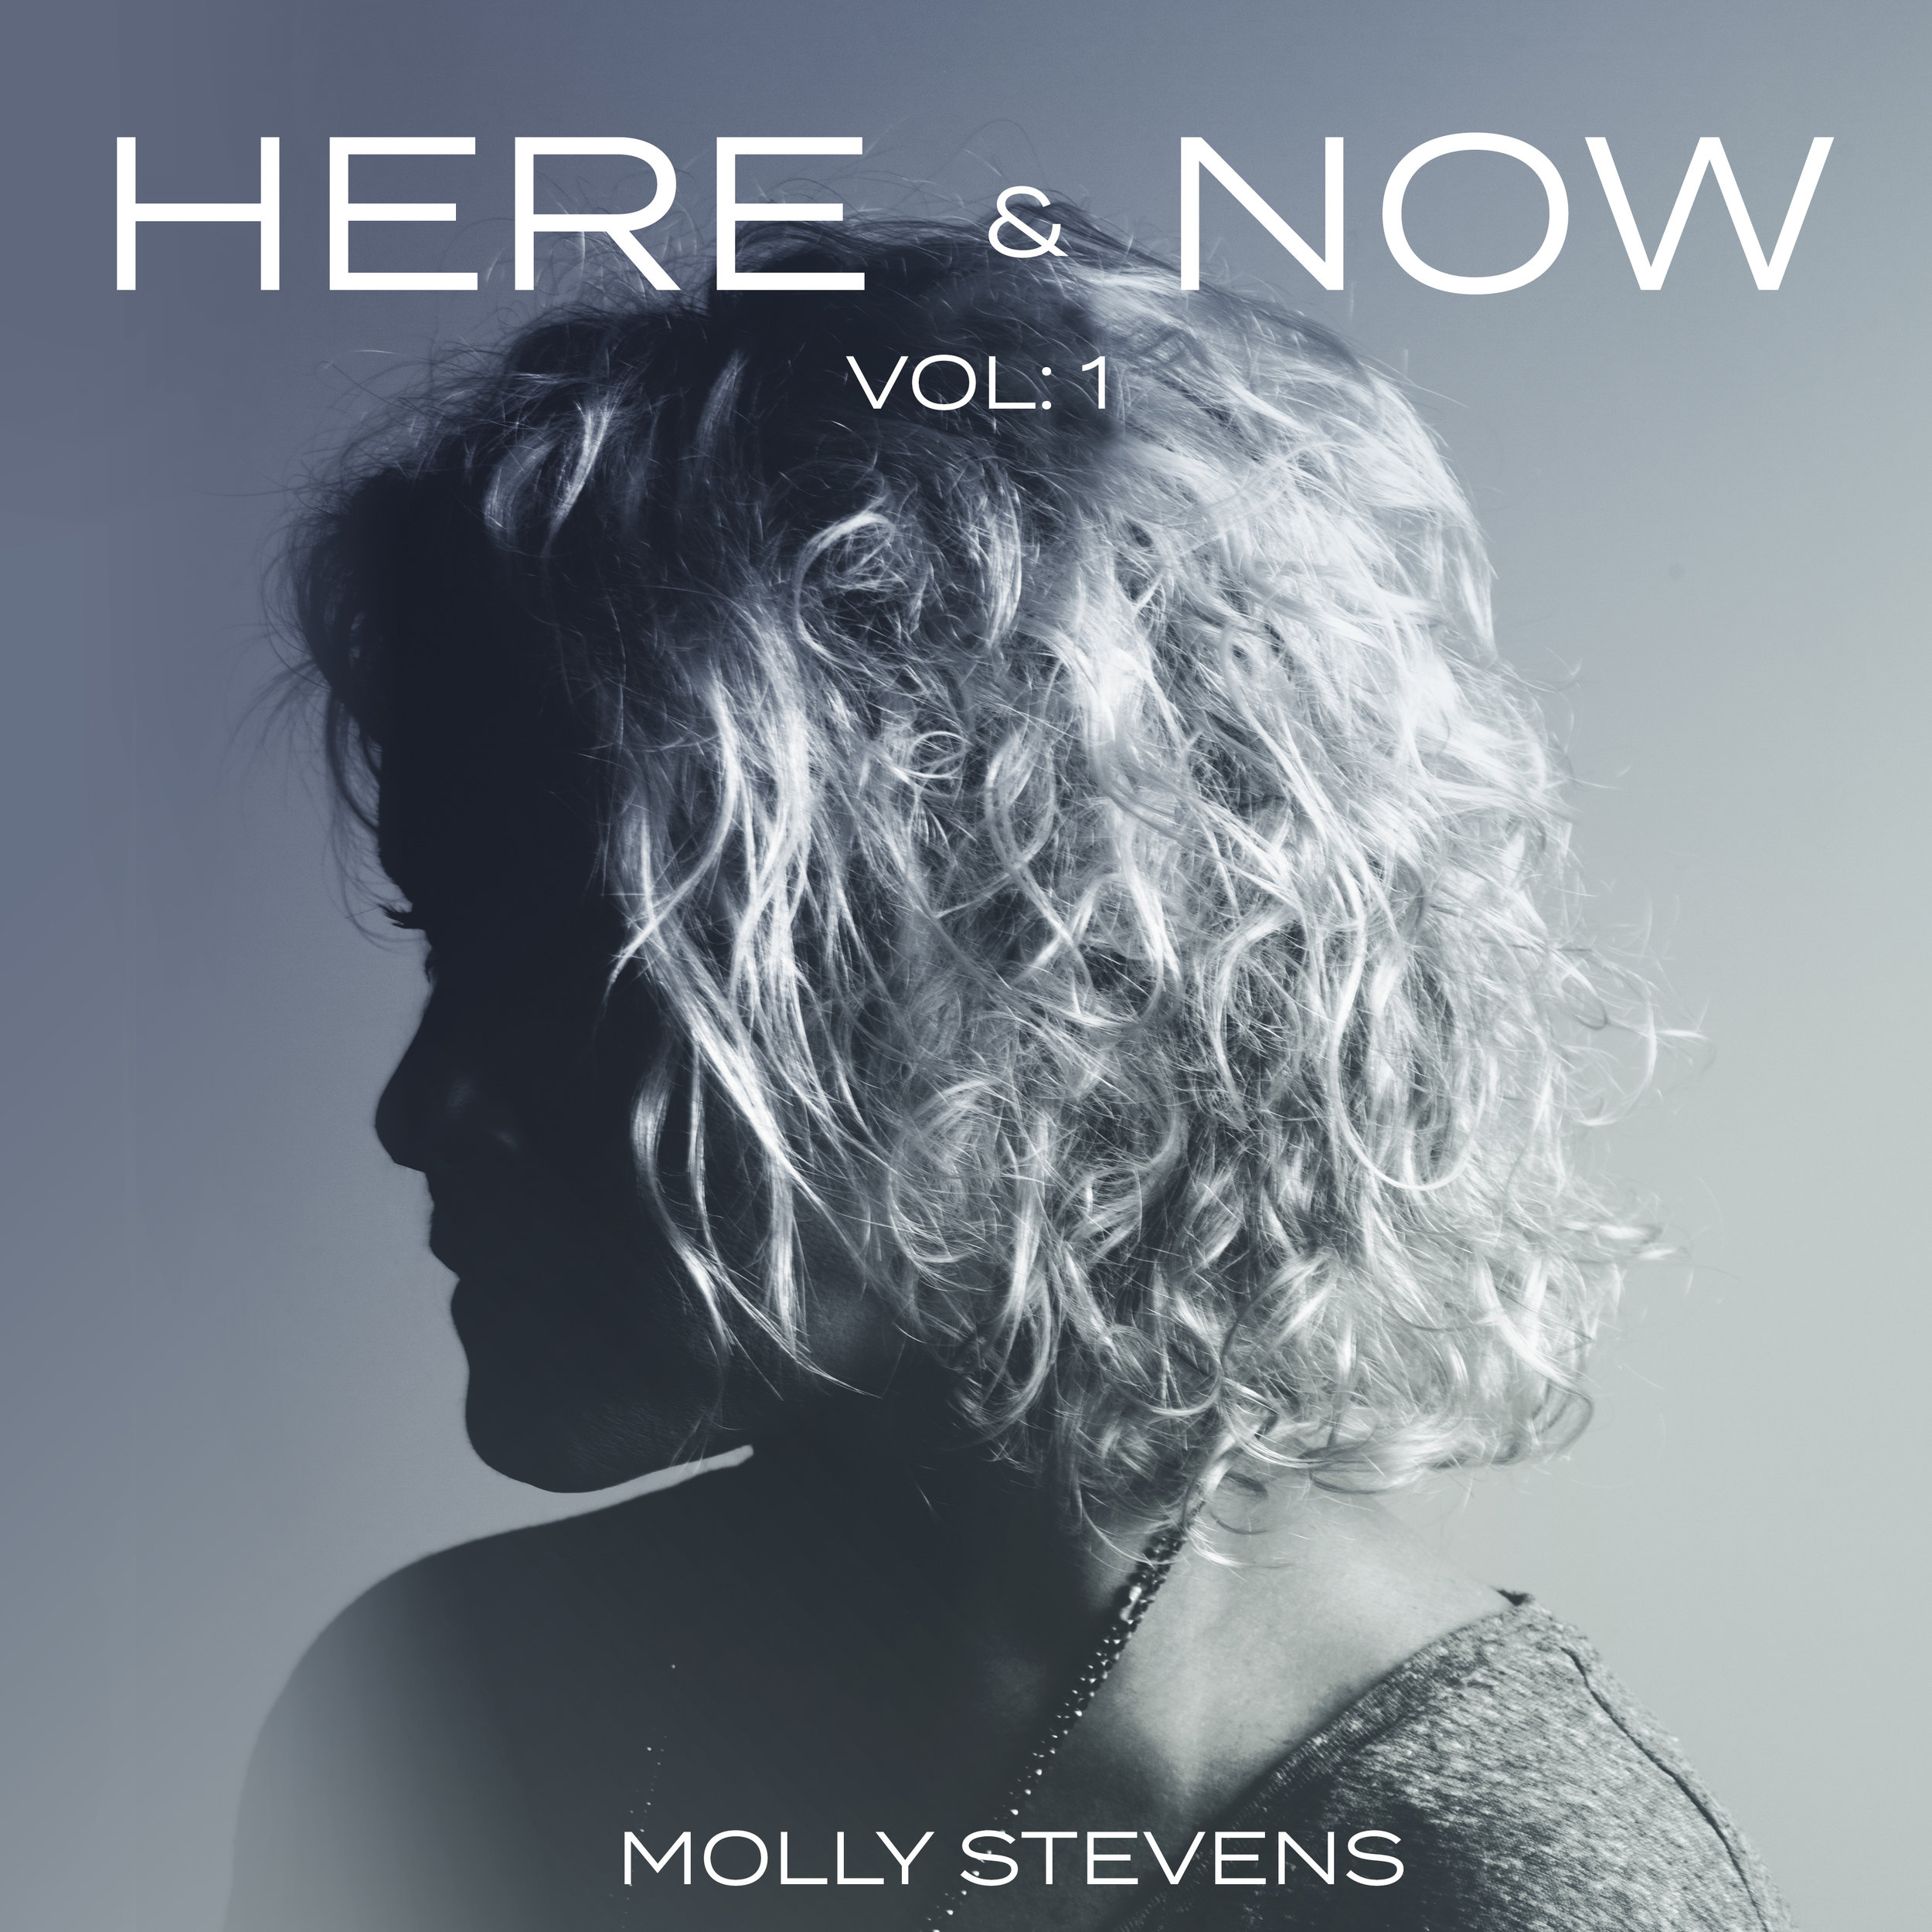 Molly Stevens - here and now ep art.jpg